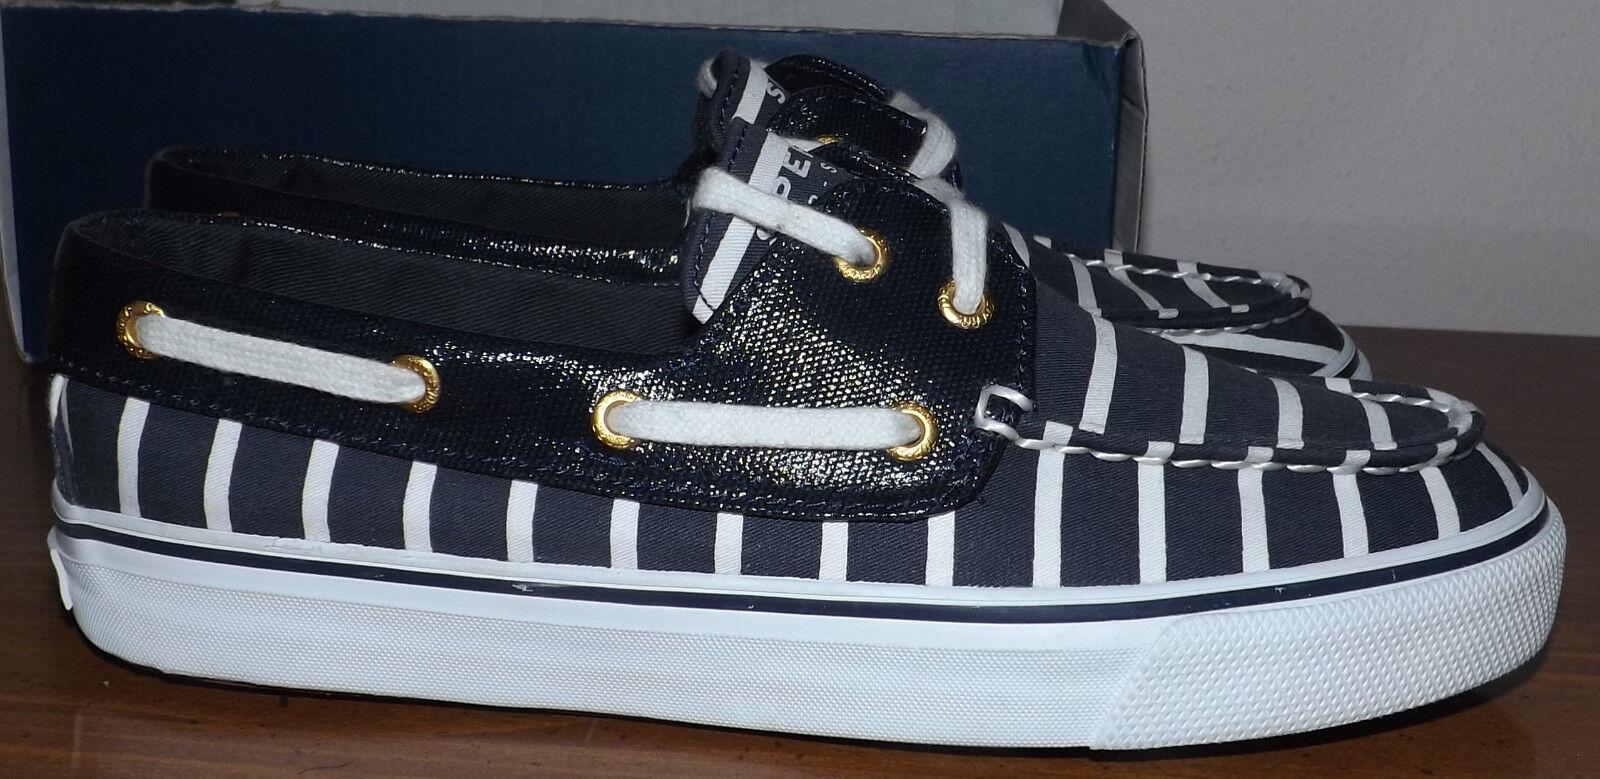 sperry haut sider biscayne bleu marine et et marine blanc confortable semelle intérieure chaussures femme taille 6 7dc8b1